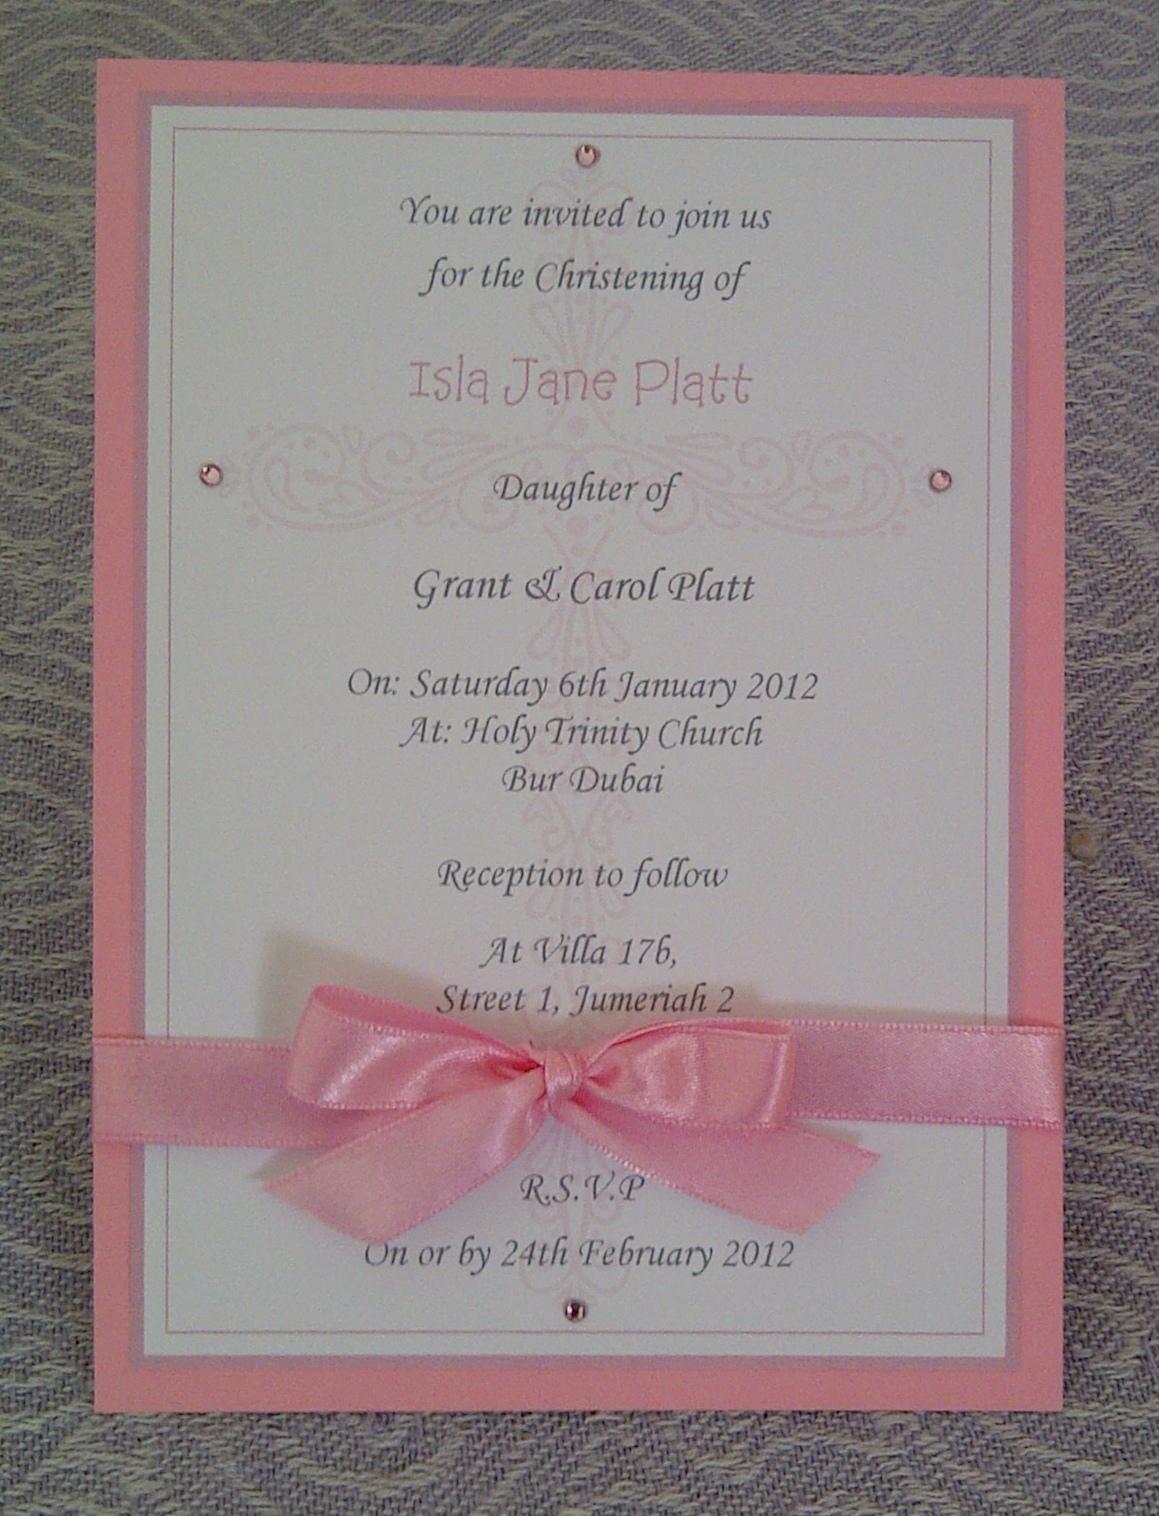 LK\'s Invitations and Wedding Stationary 00971 50 466 8096: Elegant ...